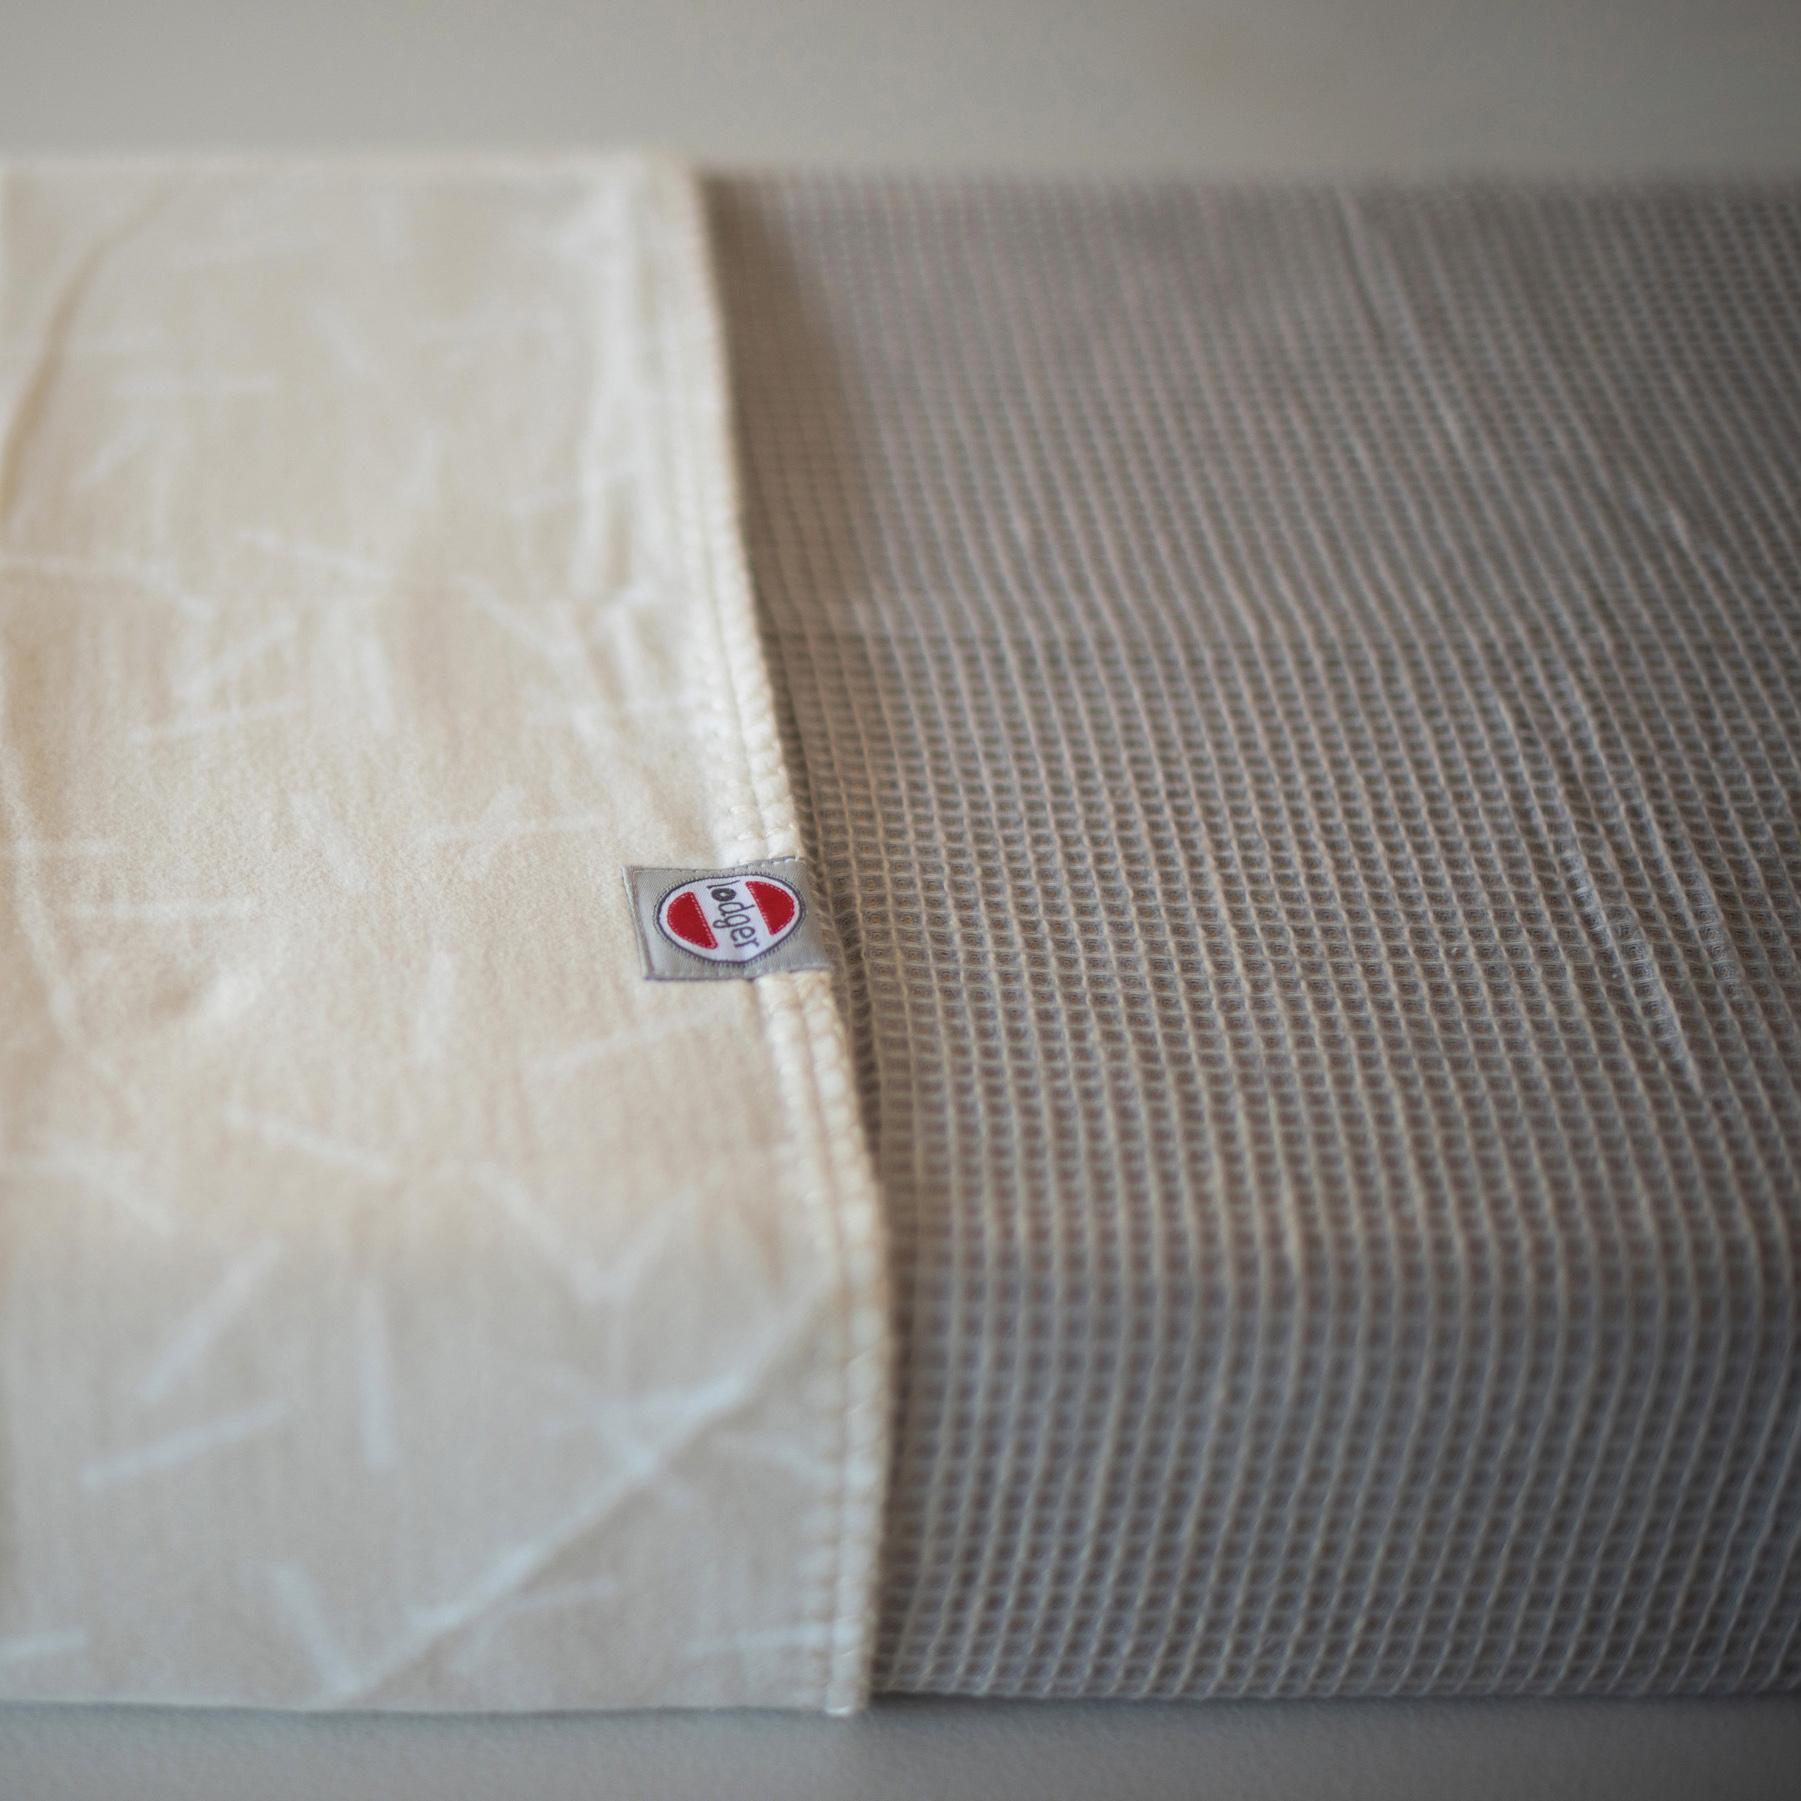 Lodger Scandinavian Baby Pram Warm Blanket 75 x 100 cm Beige